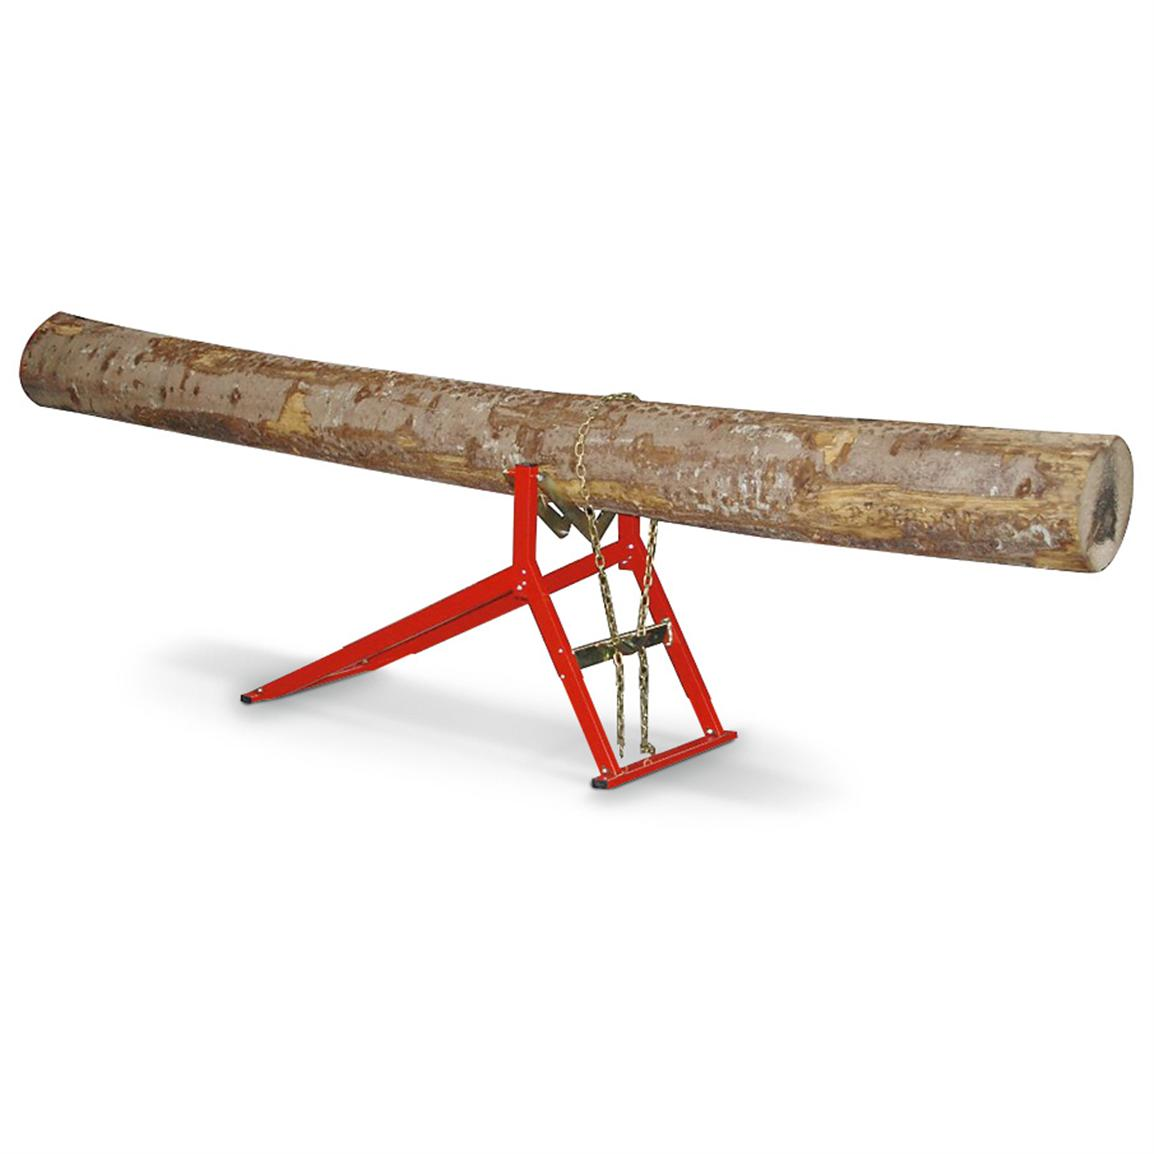 Козлы профи для пилки дров чертежи